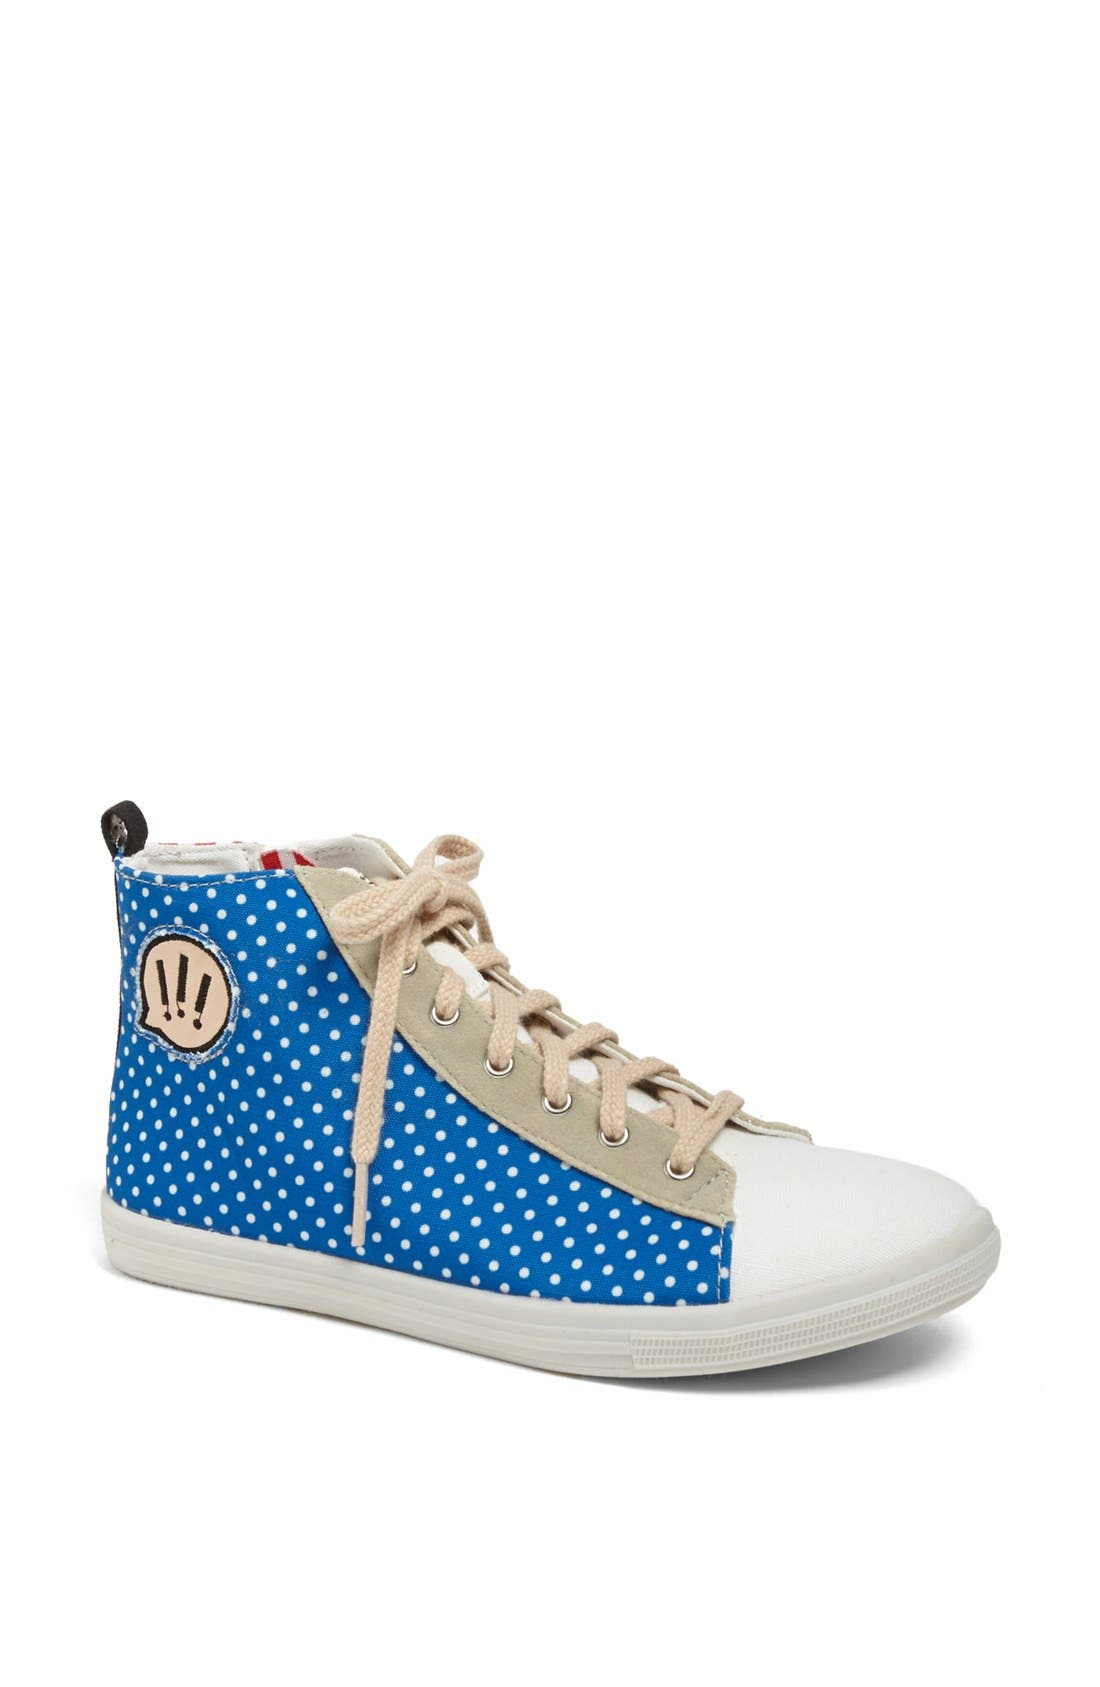 Alternate Image 1 Selected - DV8 by Dolce Vita 'Karie' Sneaker